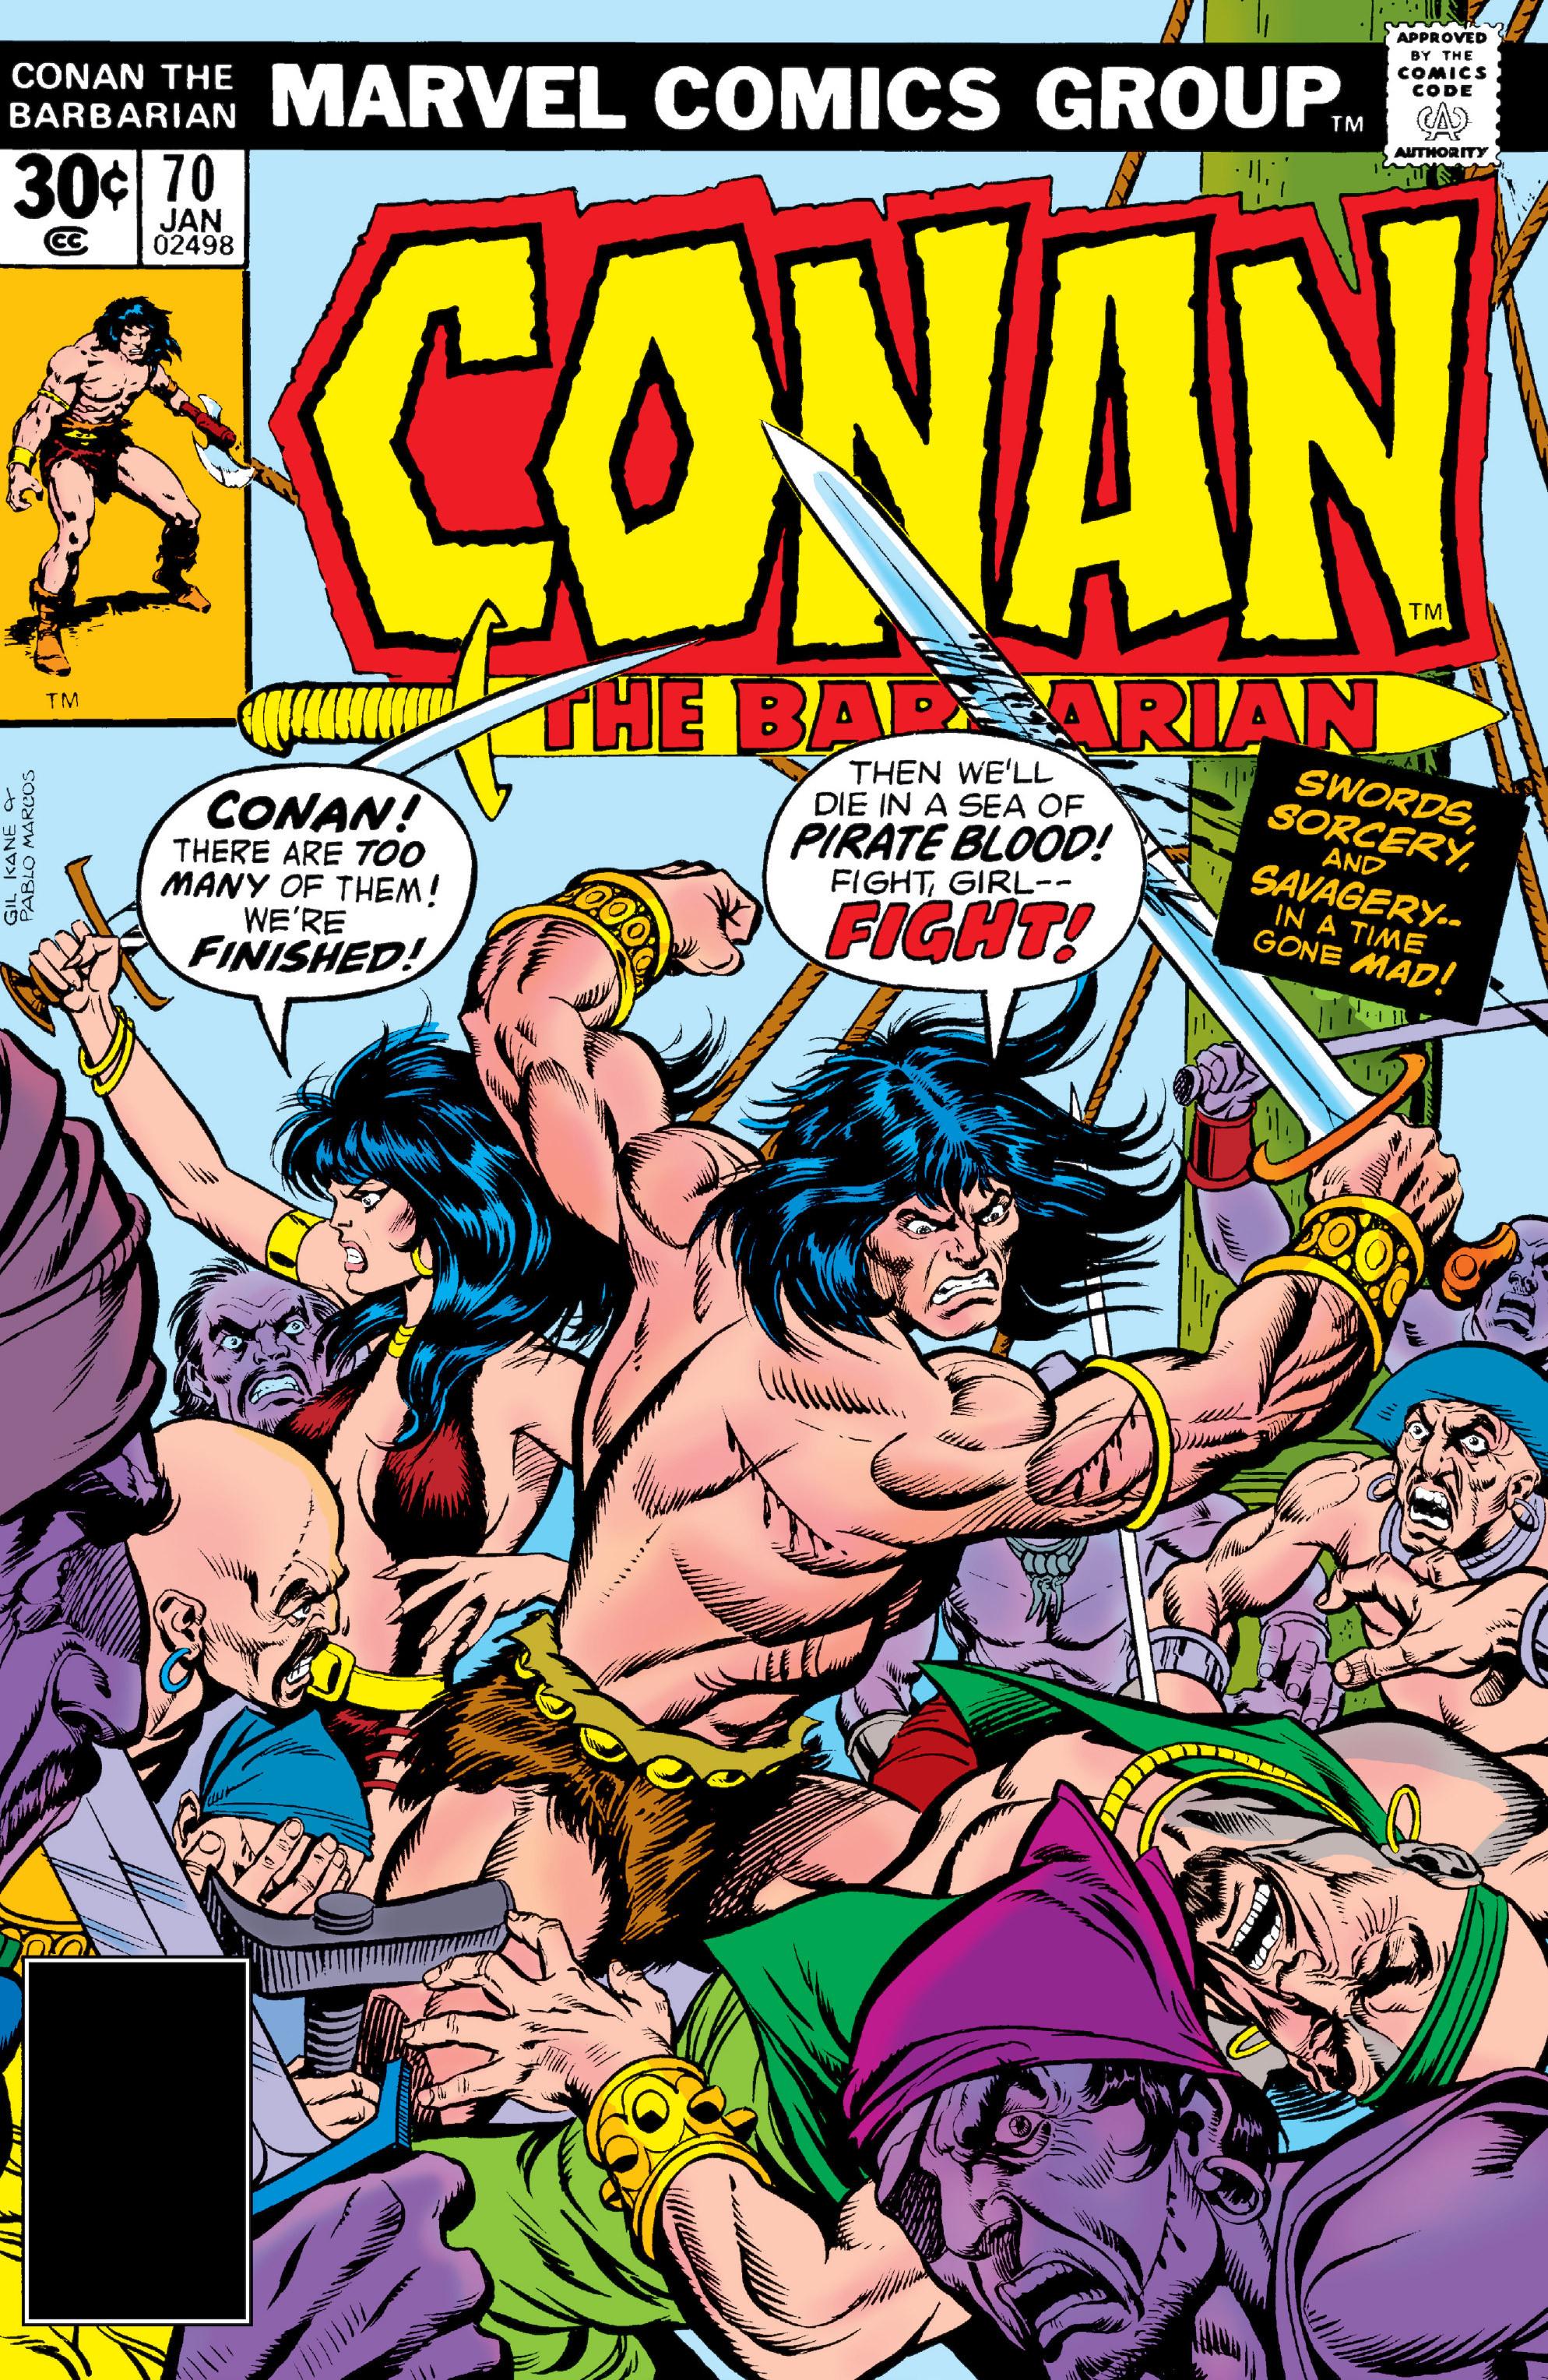 Conan the Barbarian Vol 1 70